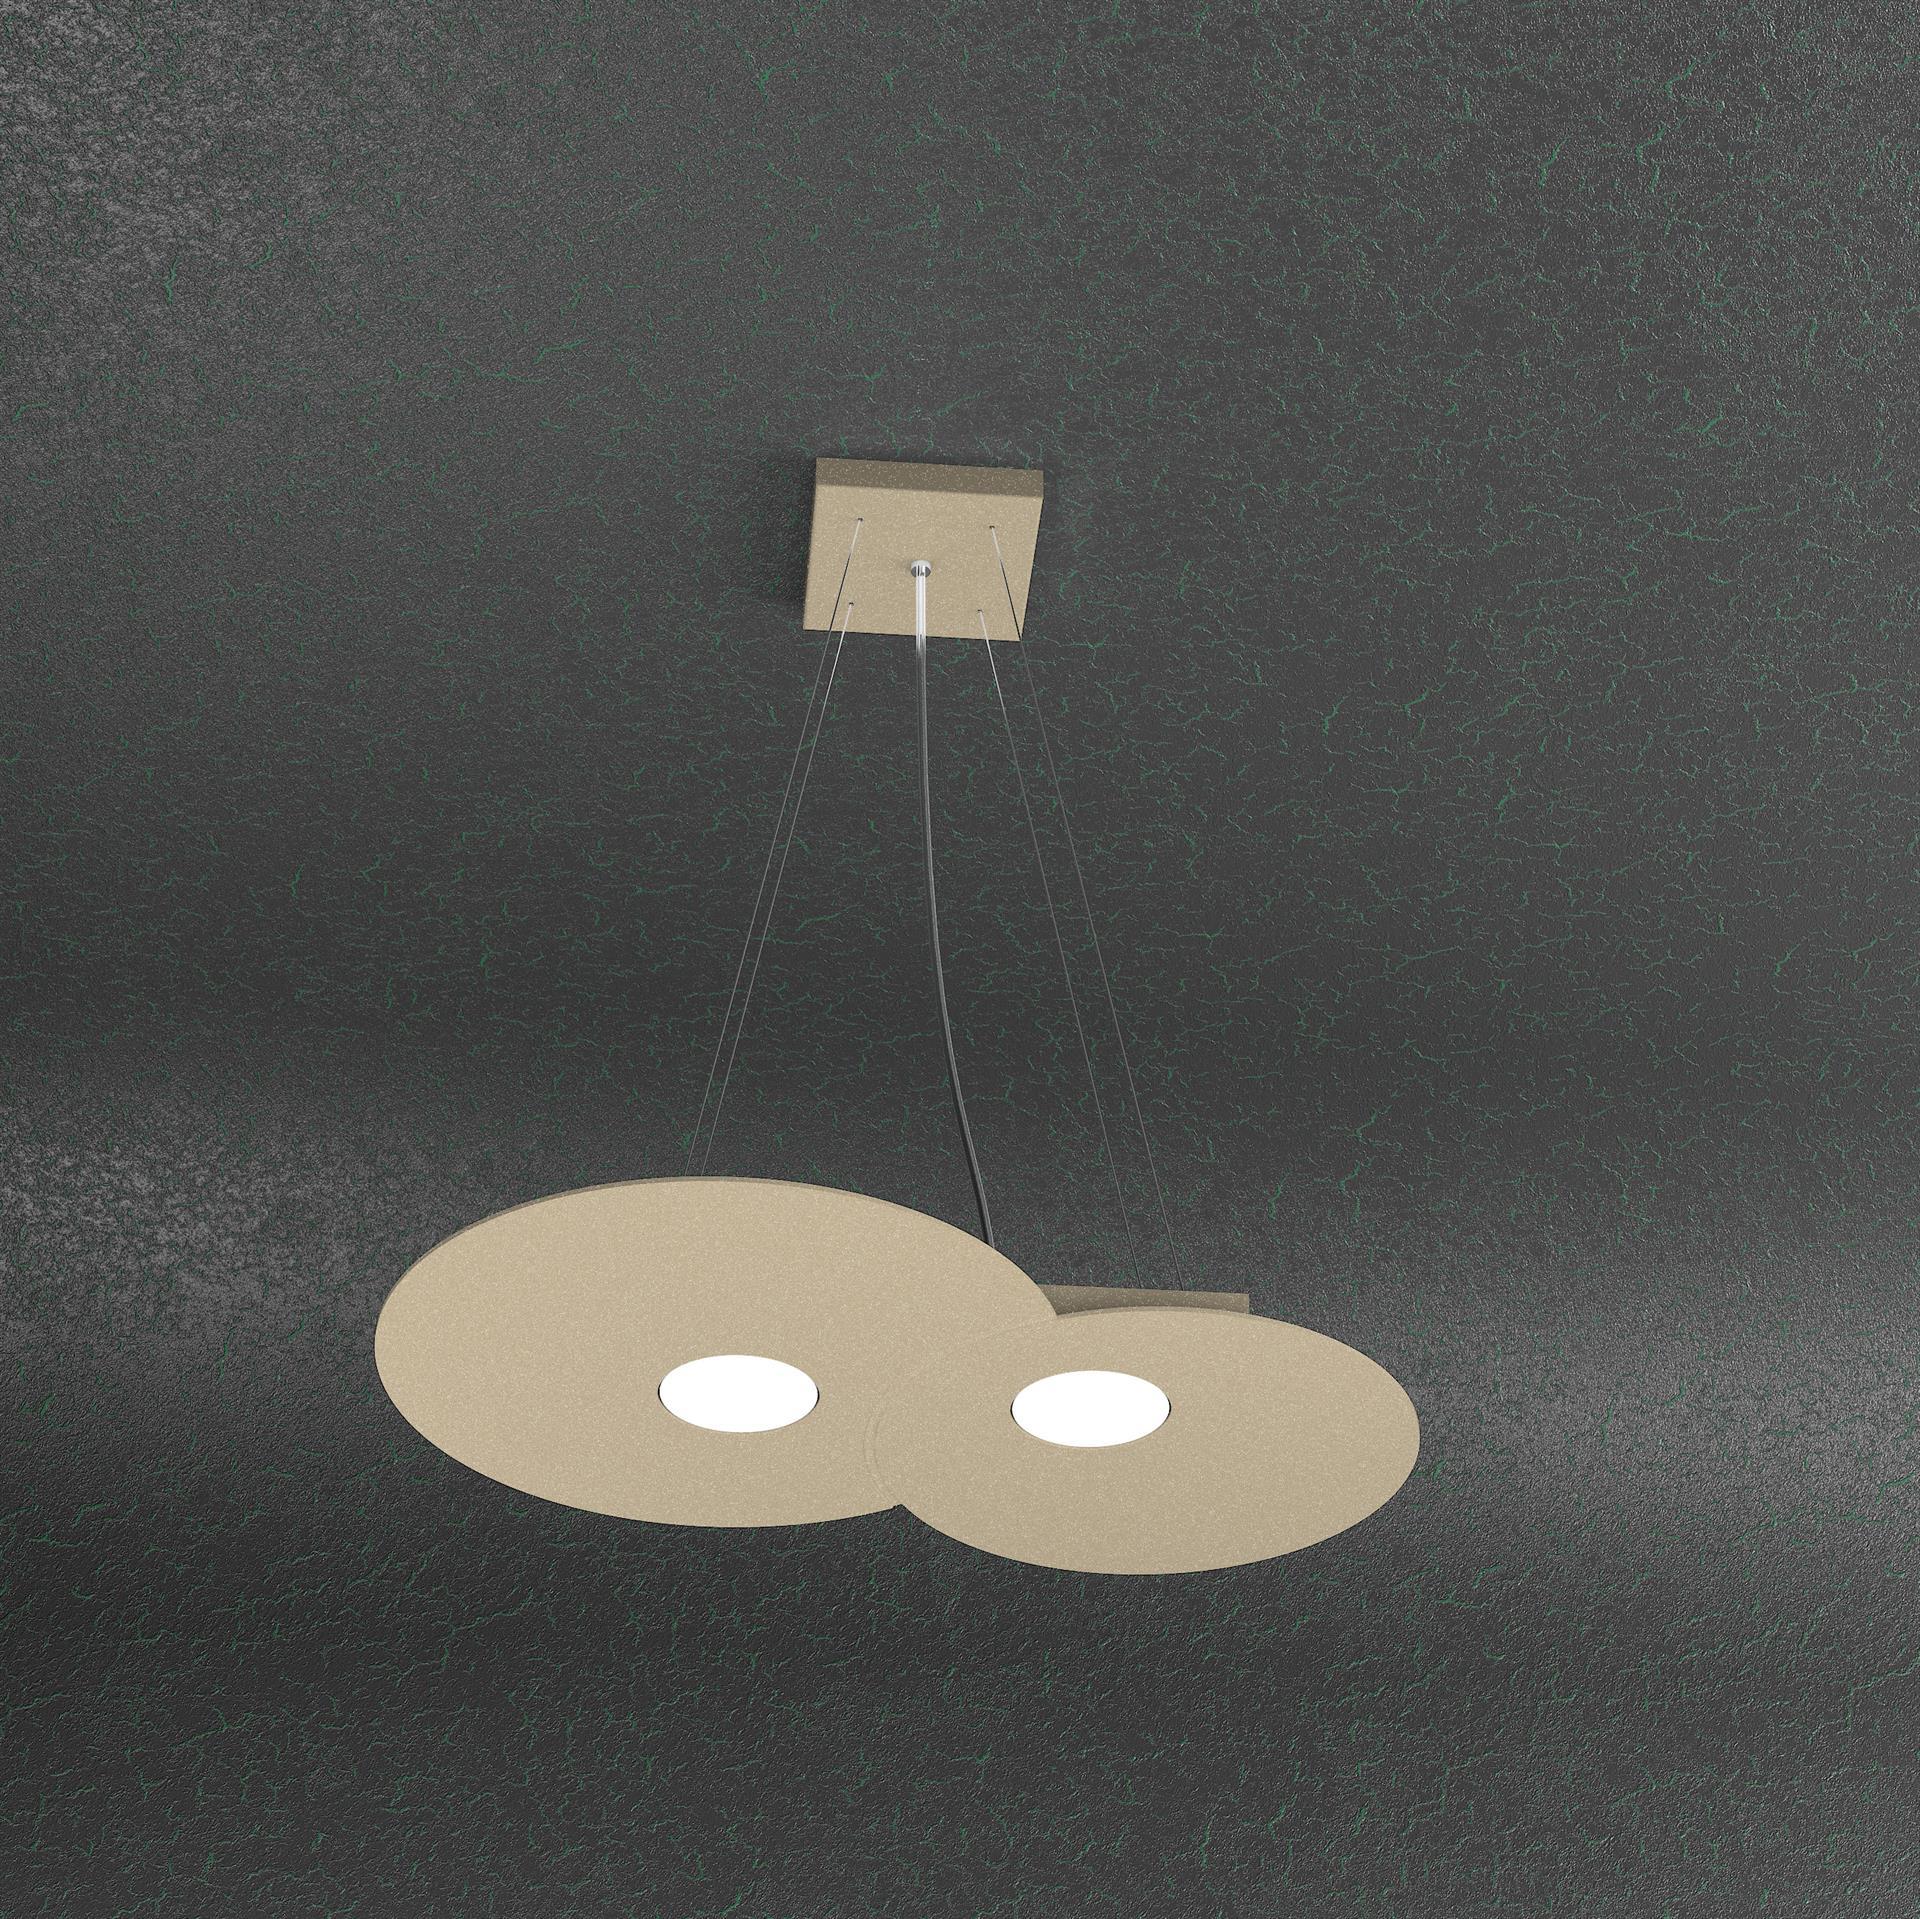 TOP LIGHT CLOUD SABBIA LAMPADARIO DA CUCINA 2 LUCI LED DESIGN ...